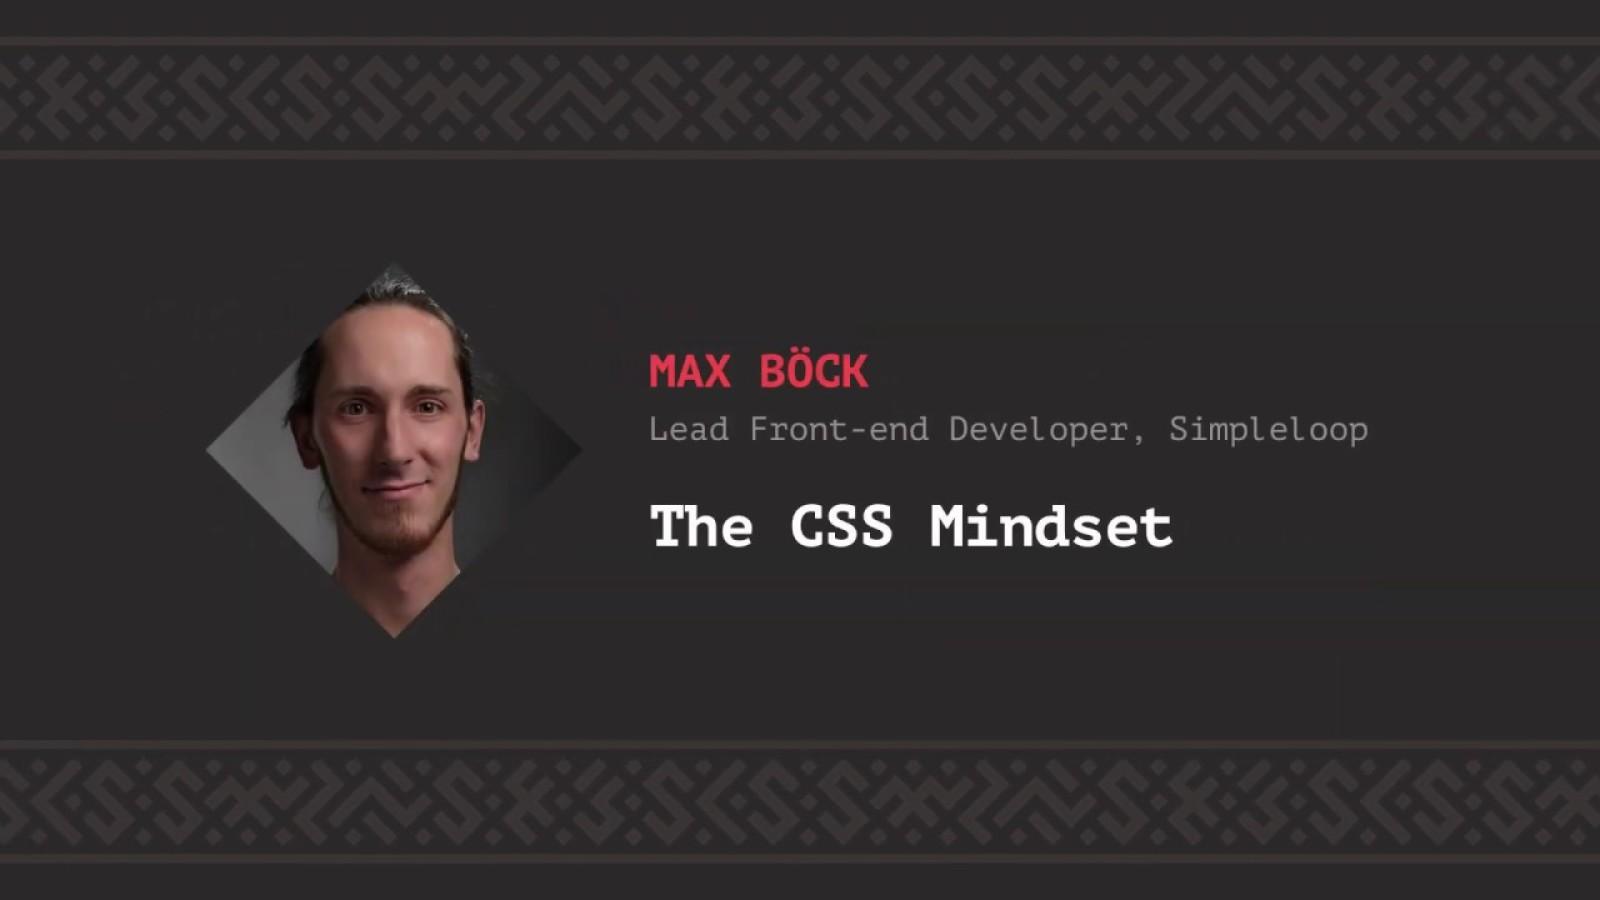 The CSS Mindset